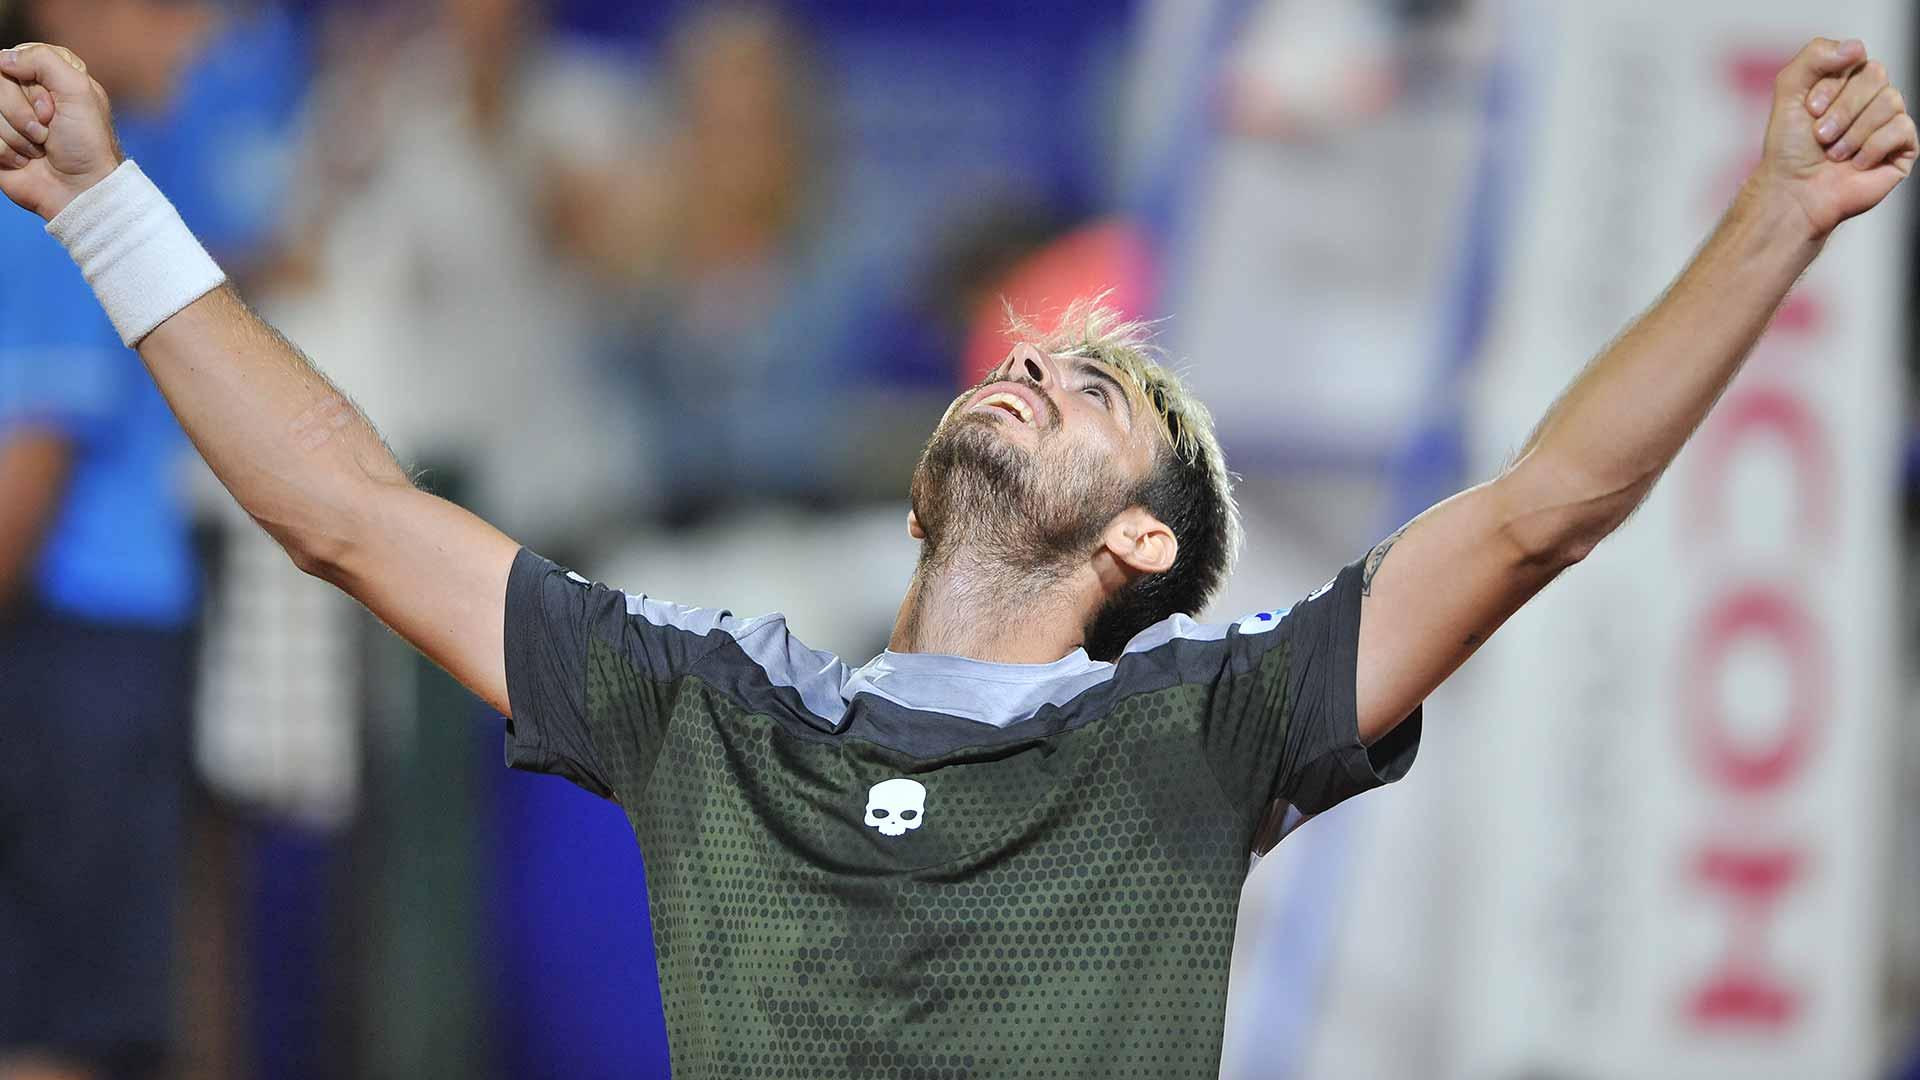 Londero beats Pella to win <a href='https://www.atptour.com/en/tournaments/cordoba/9158/overview'>Cordoba Open</a>